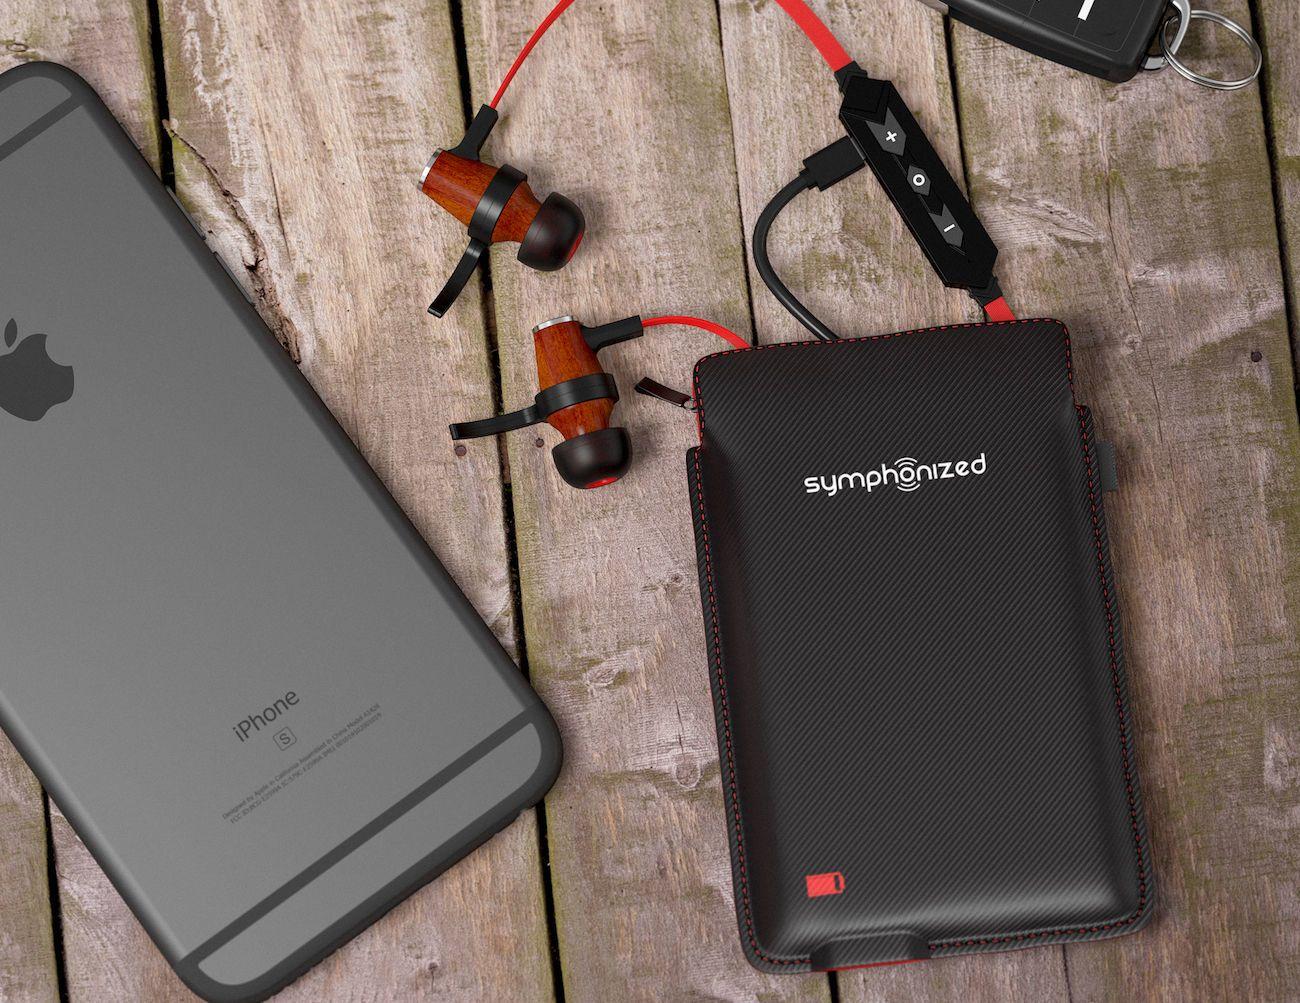 Symphonized Bluetooth Headphone Charging Case